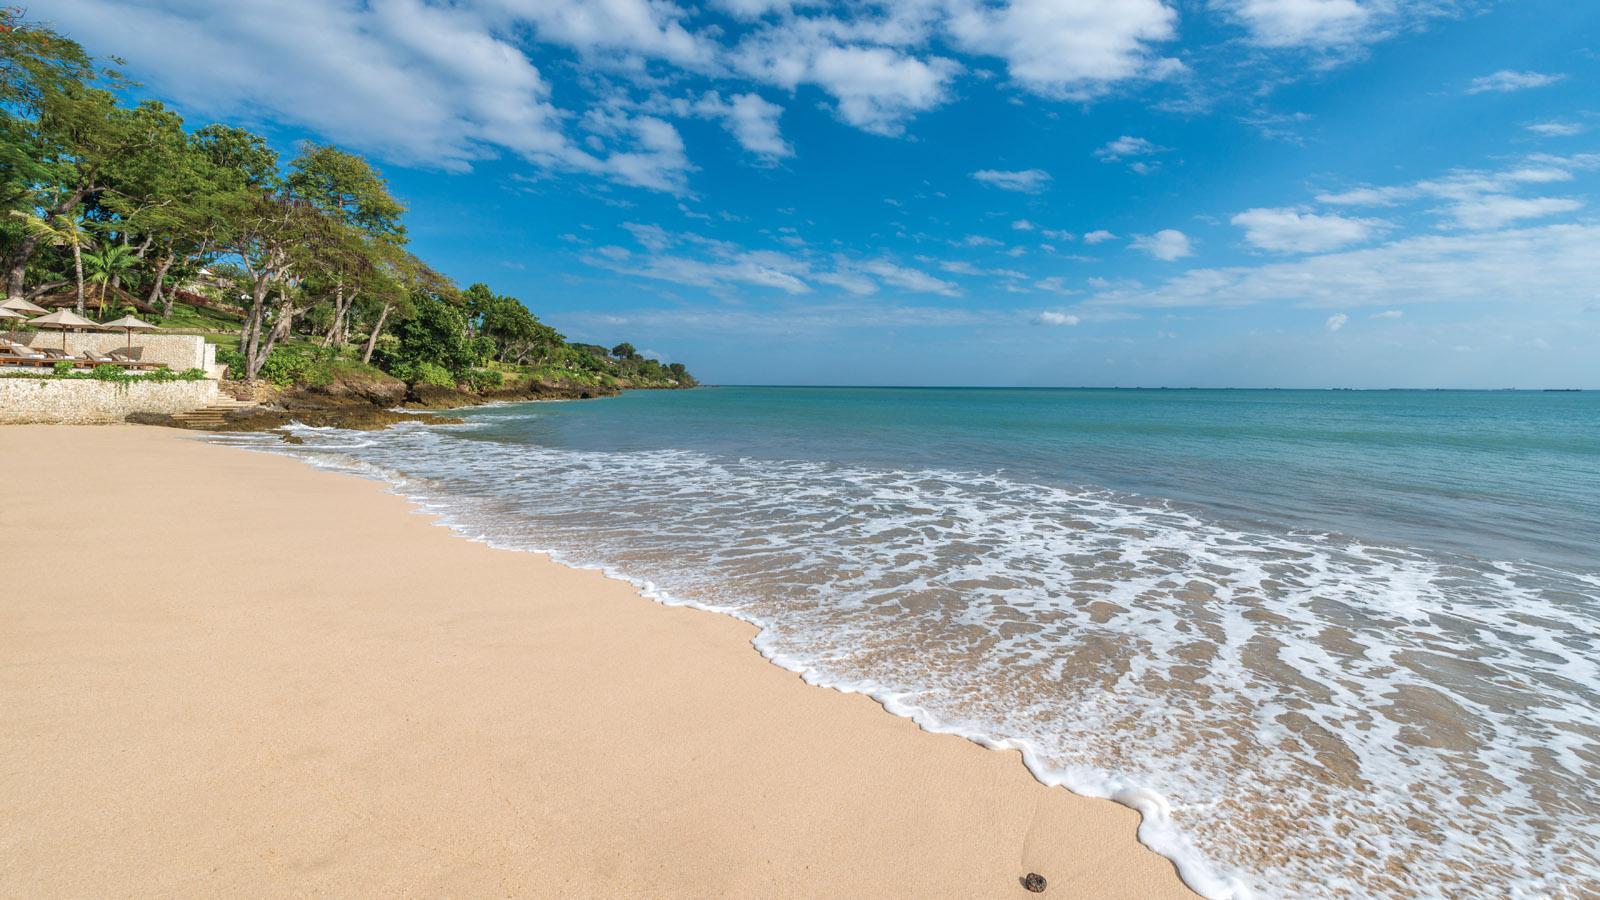 Four Seasons Bali At Jimbaran Bay Perfect For Corporate Events And